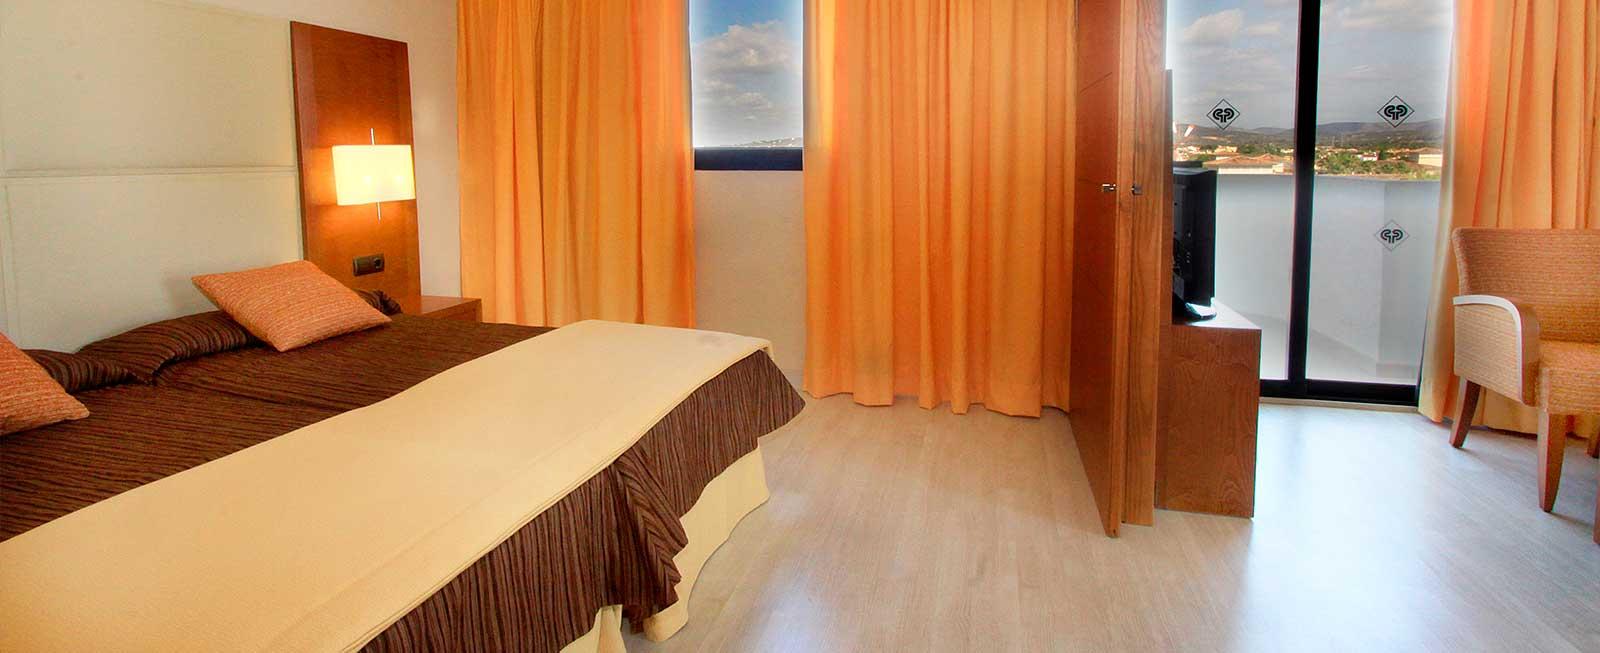 Doble Deluxe Protur plameras Playa Aparthotel